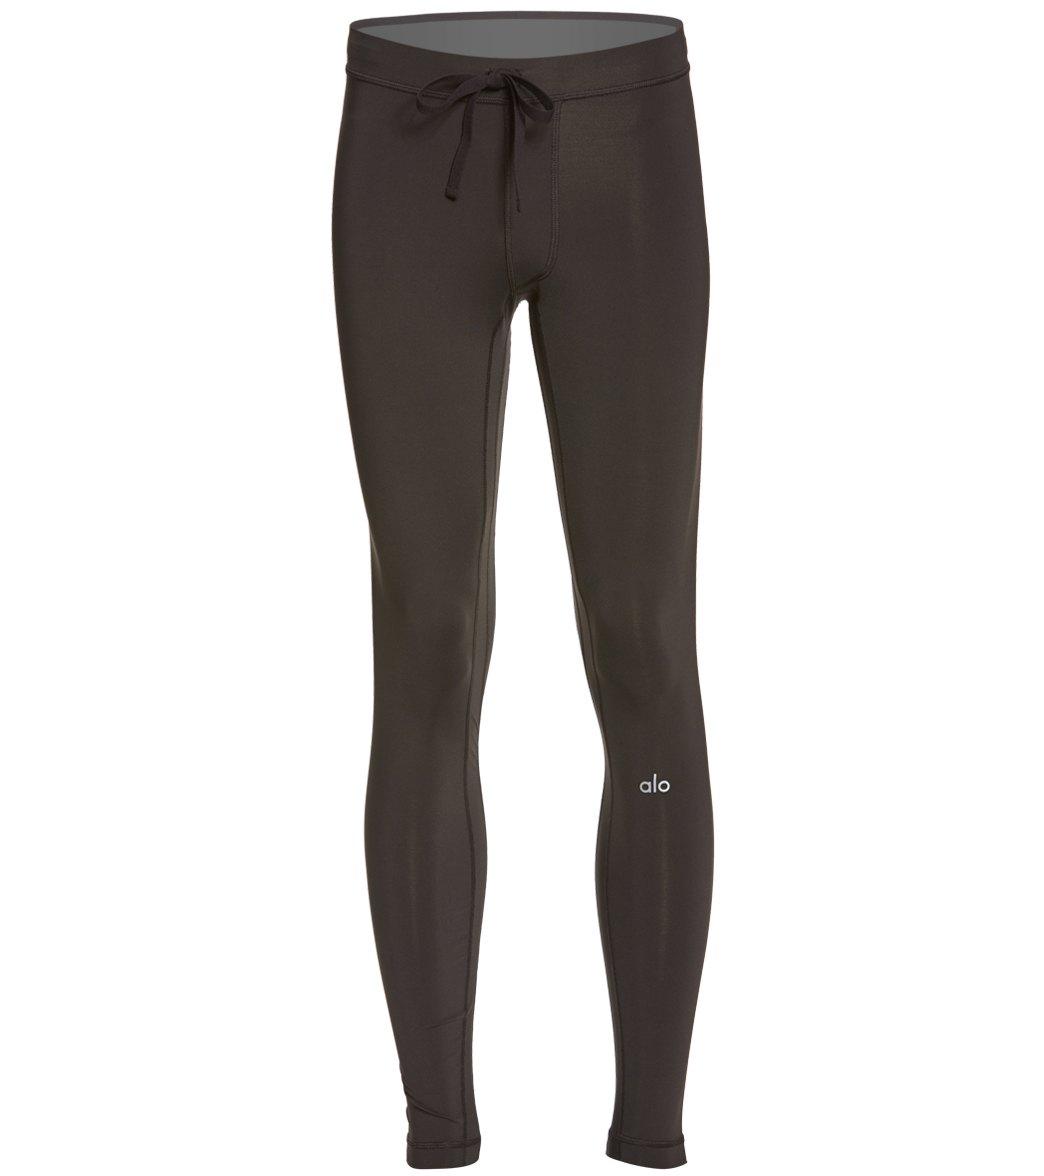 aa3369c271 Alo Yoga Men's Warrior Compression Yoga Pants at SwimOutlet.com - Free  Shipping